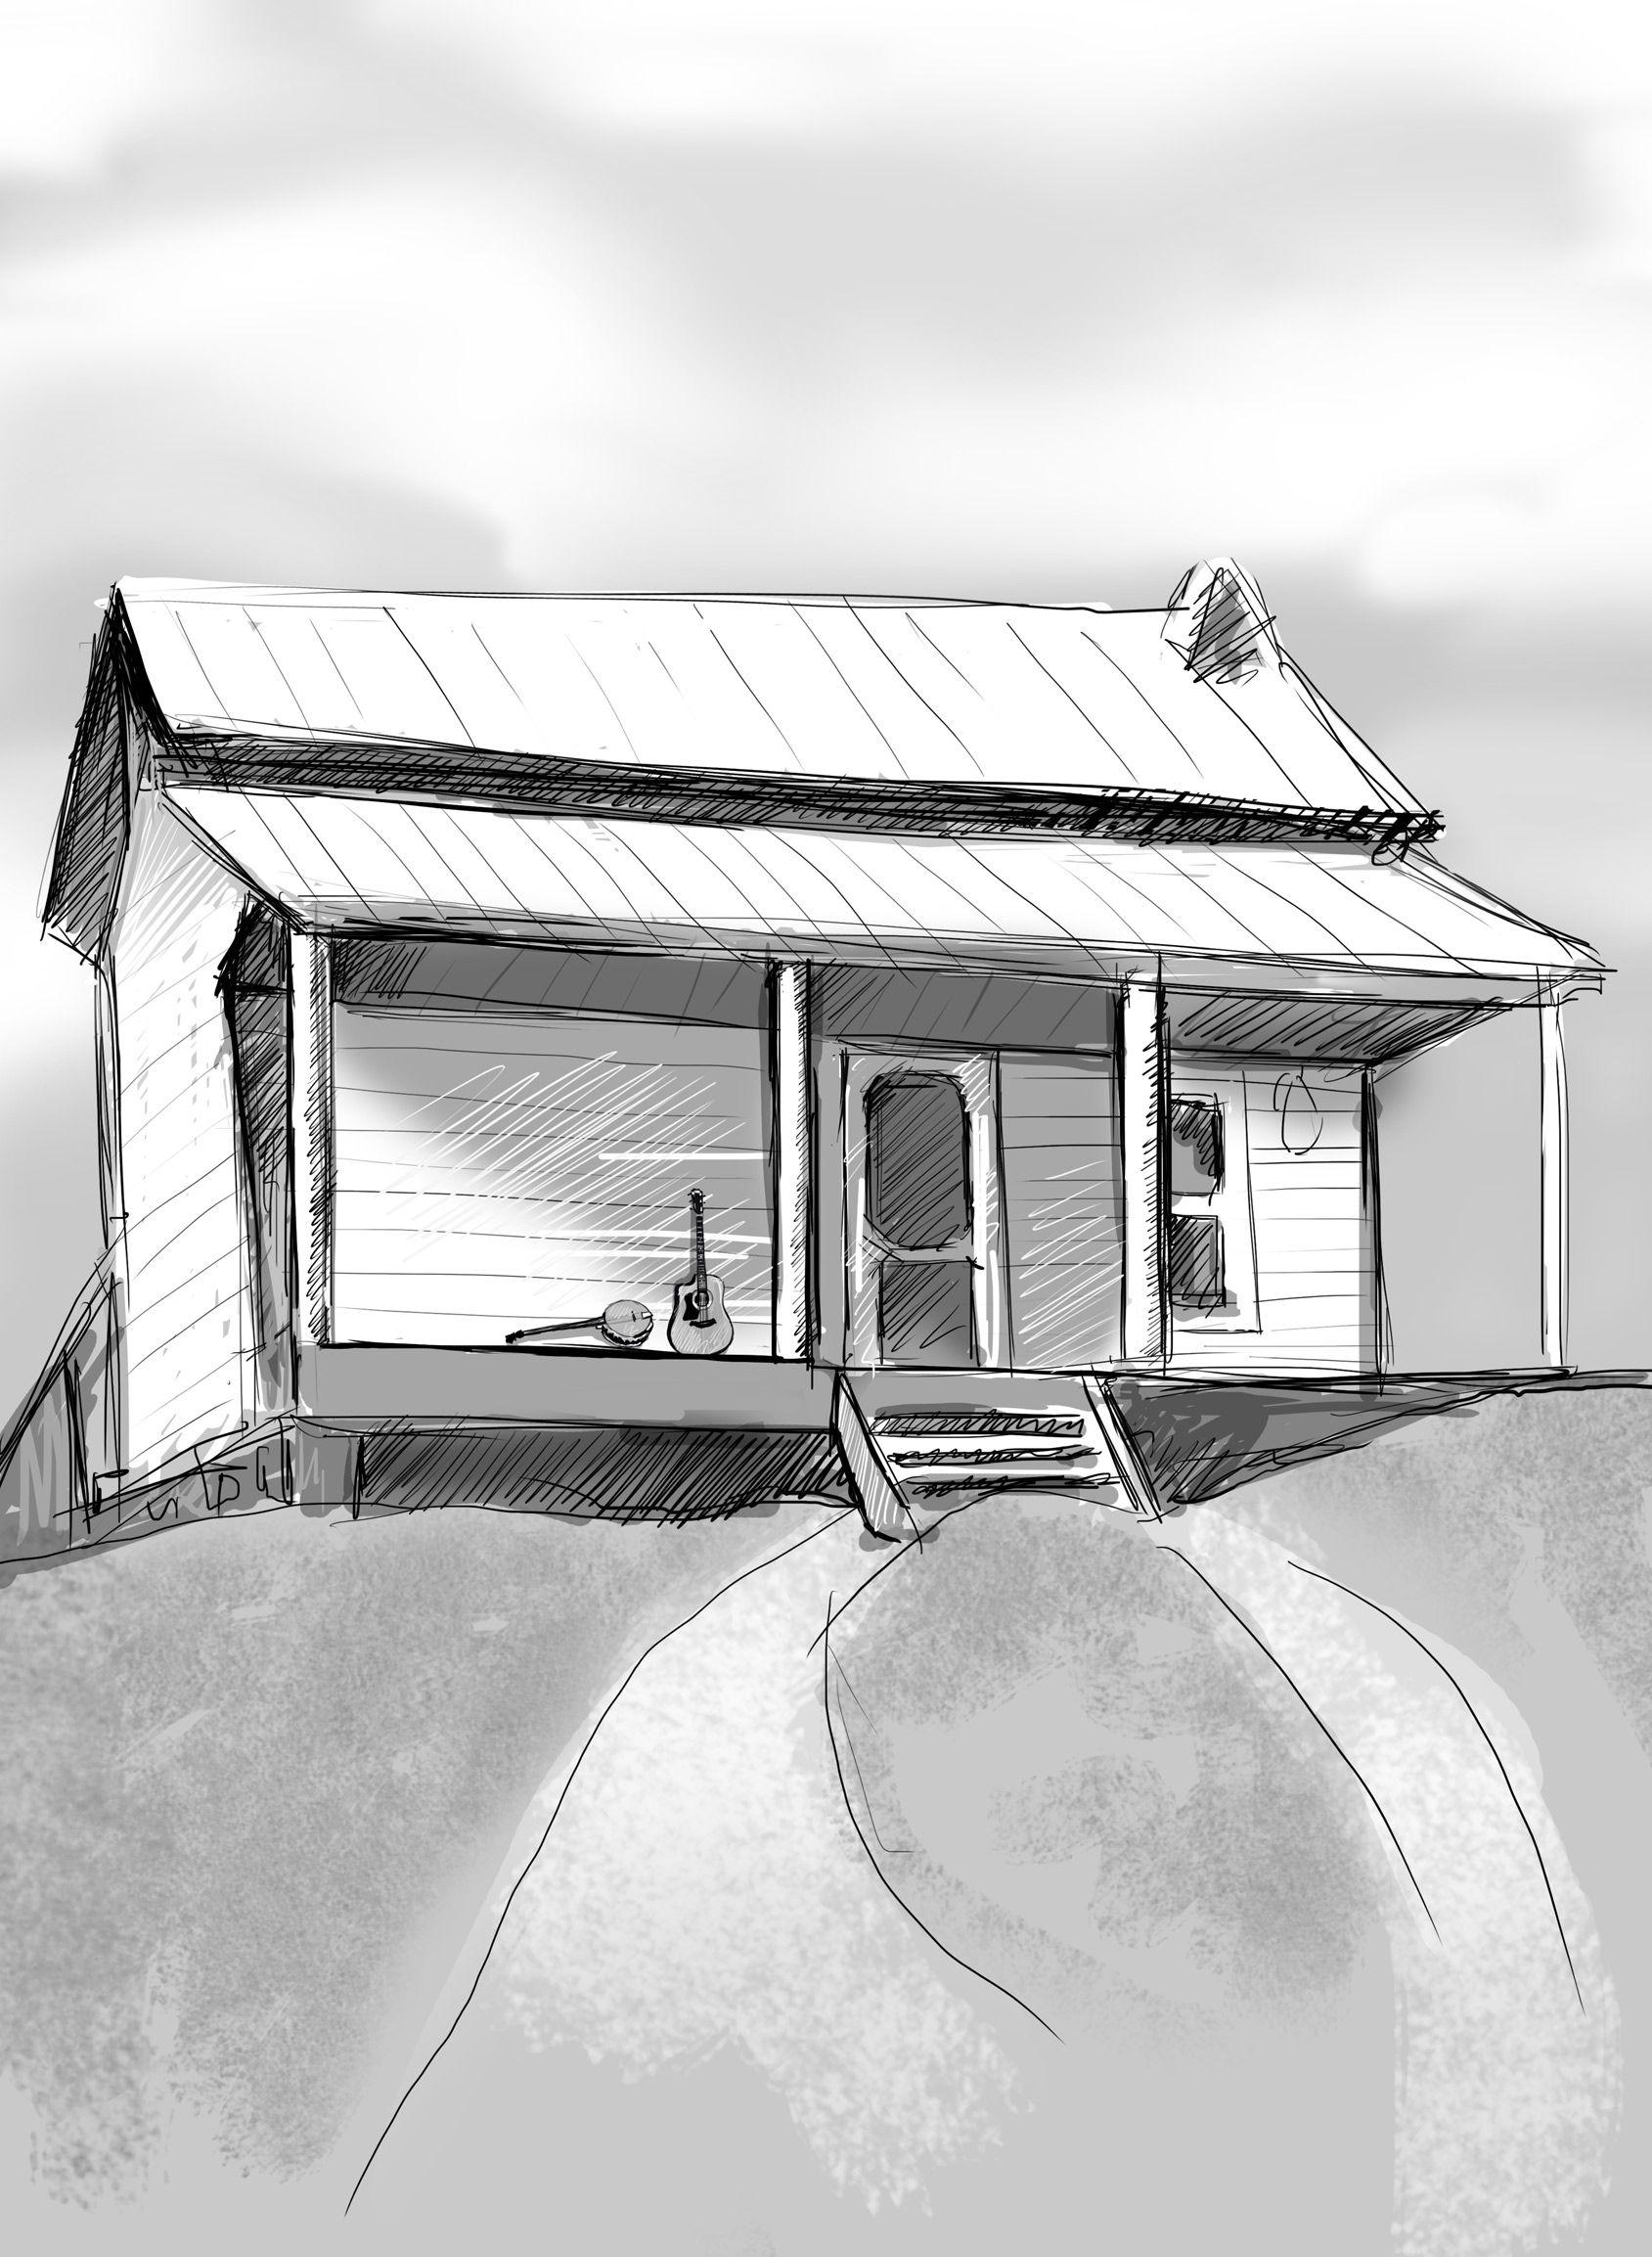 Doc Watson S House In Deep Gap North Carolina Circa 1960 Beautiful Drawing By Kristina Tosic Will Be In The Third Doc Watson Beautiful Drawings Beautiful